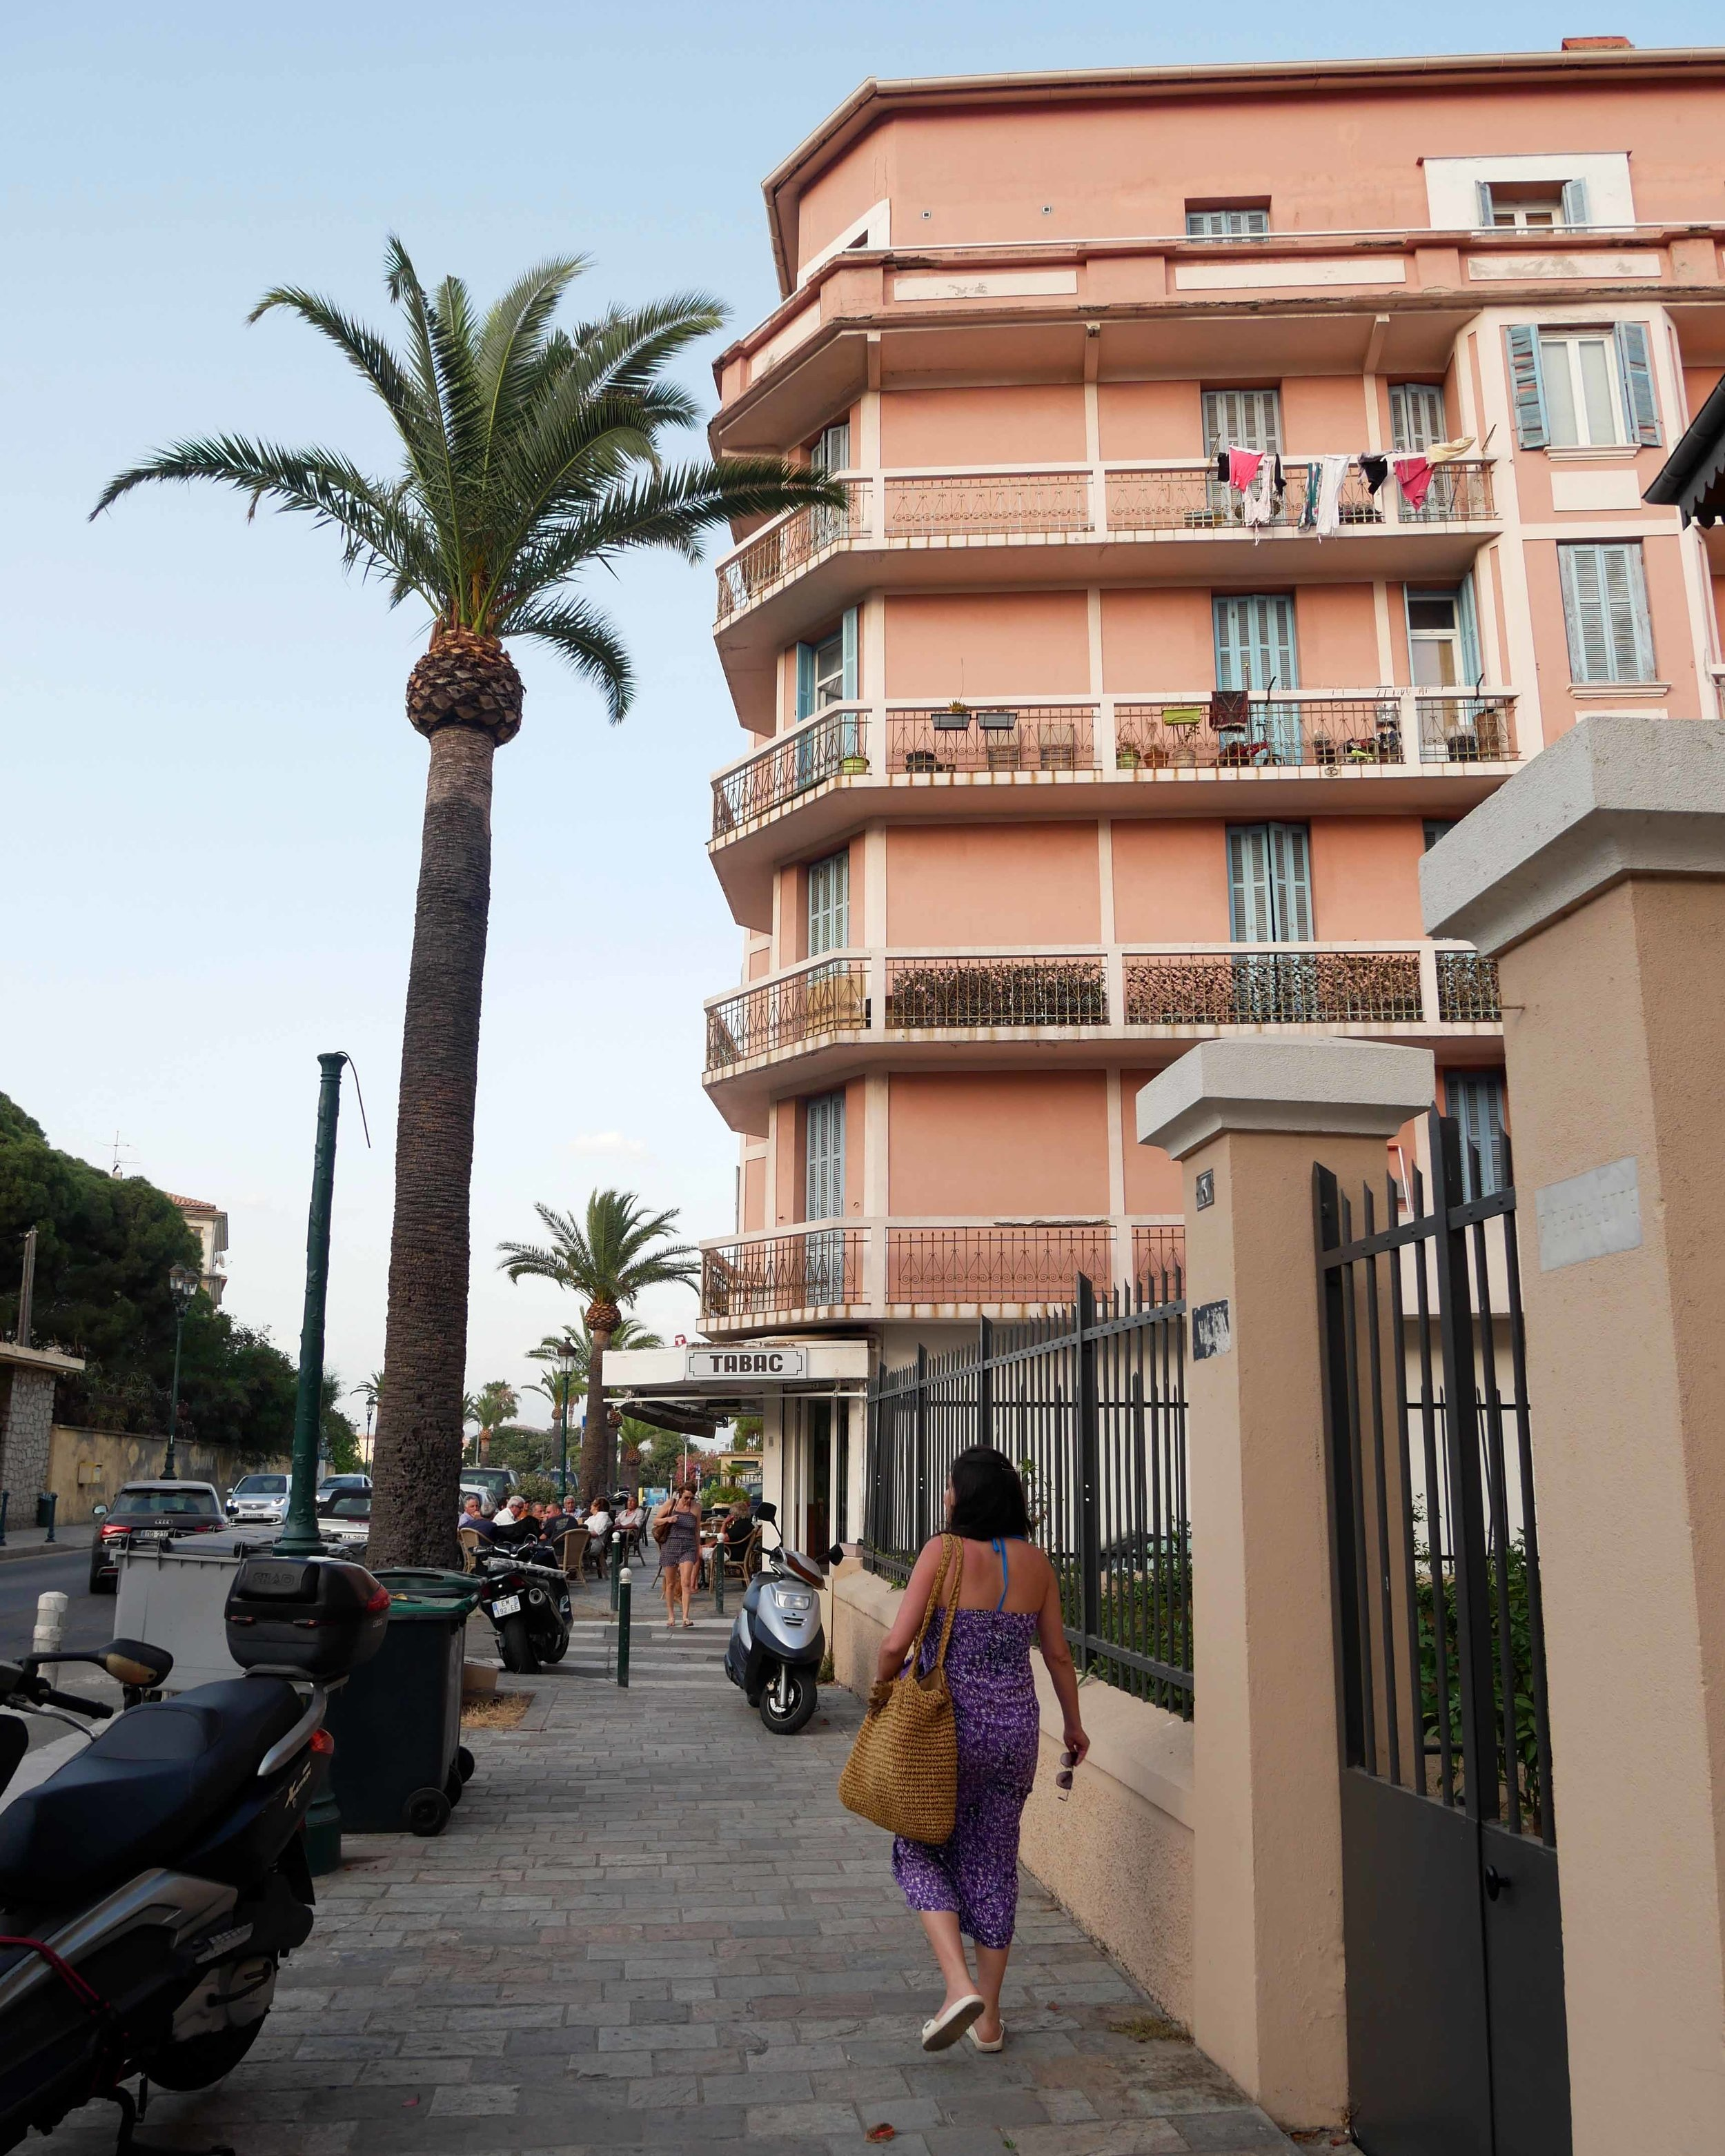 Strolling through the retro streets of Ajaccio